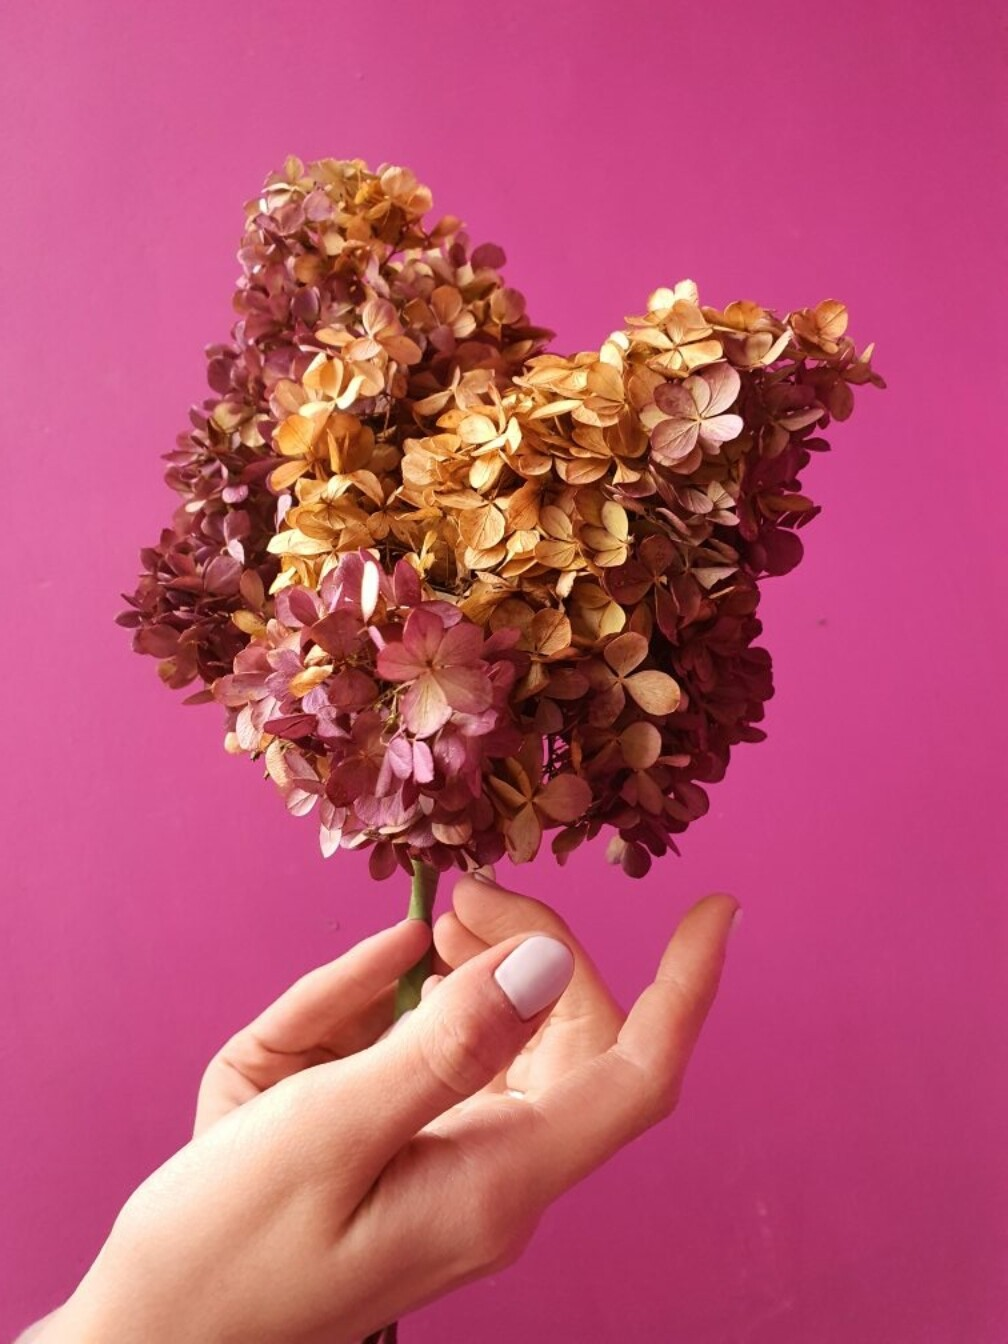 Hydrangea dried flowers